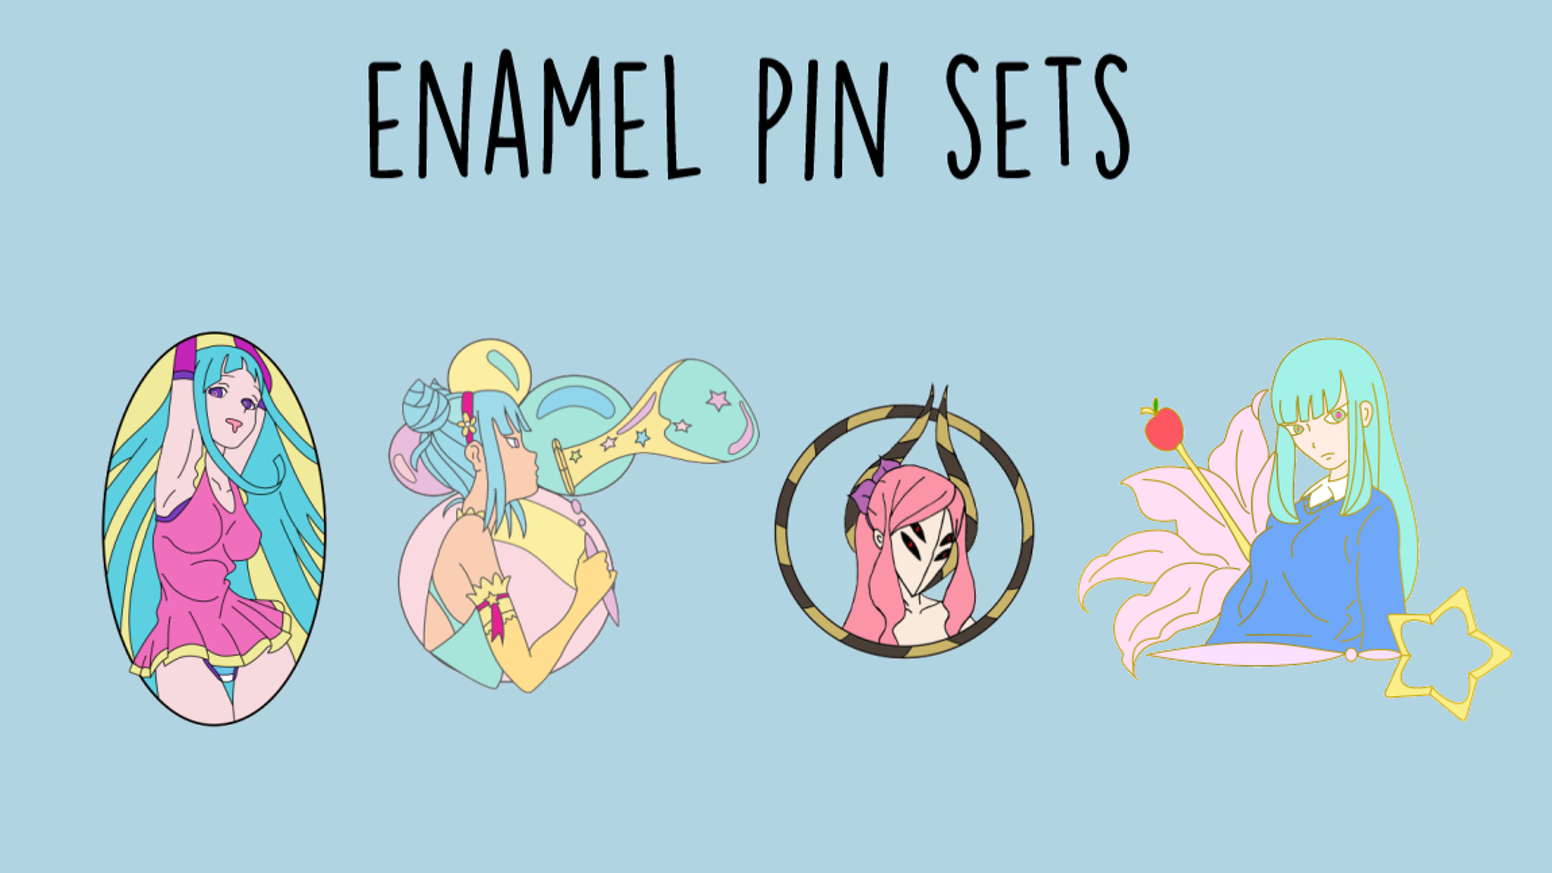 kawaii creepy enamel pins mememe and girl themed by rose